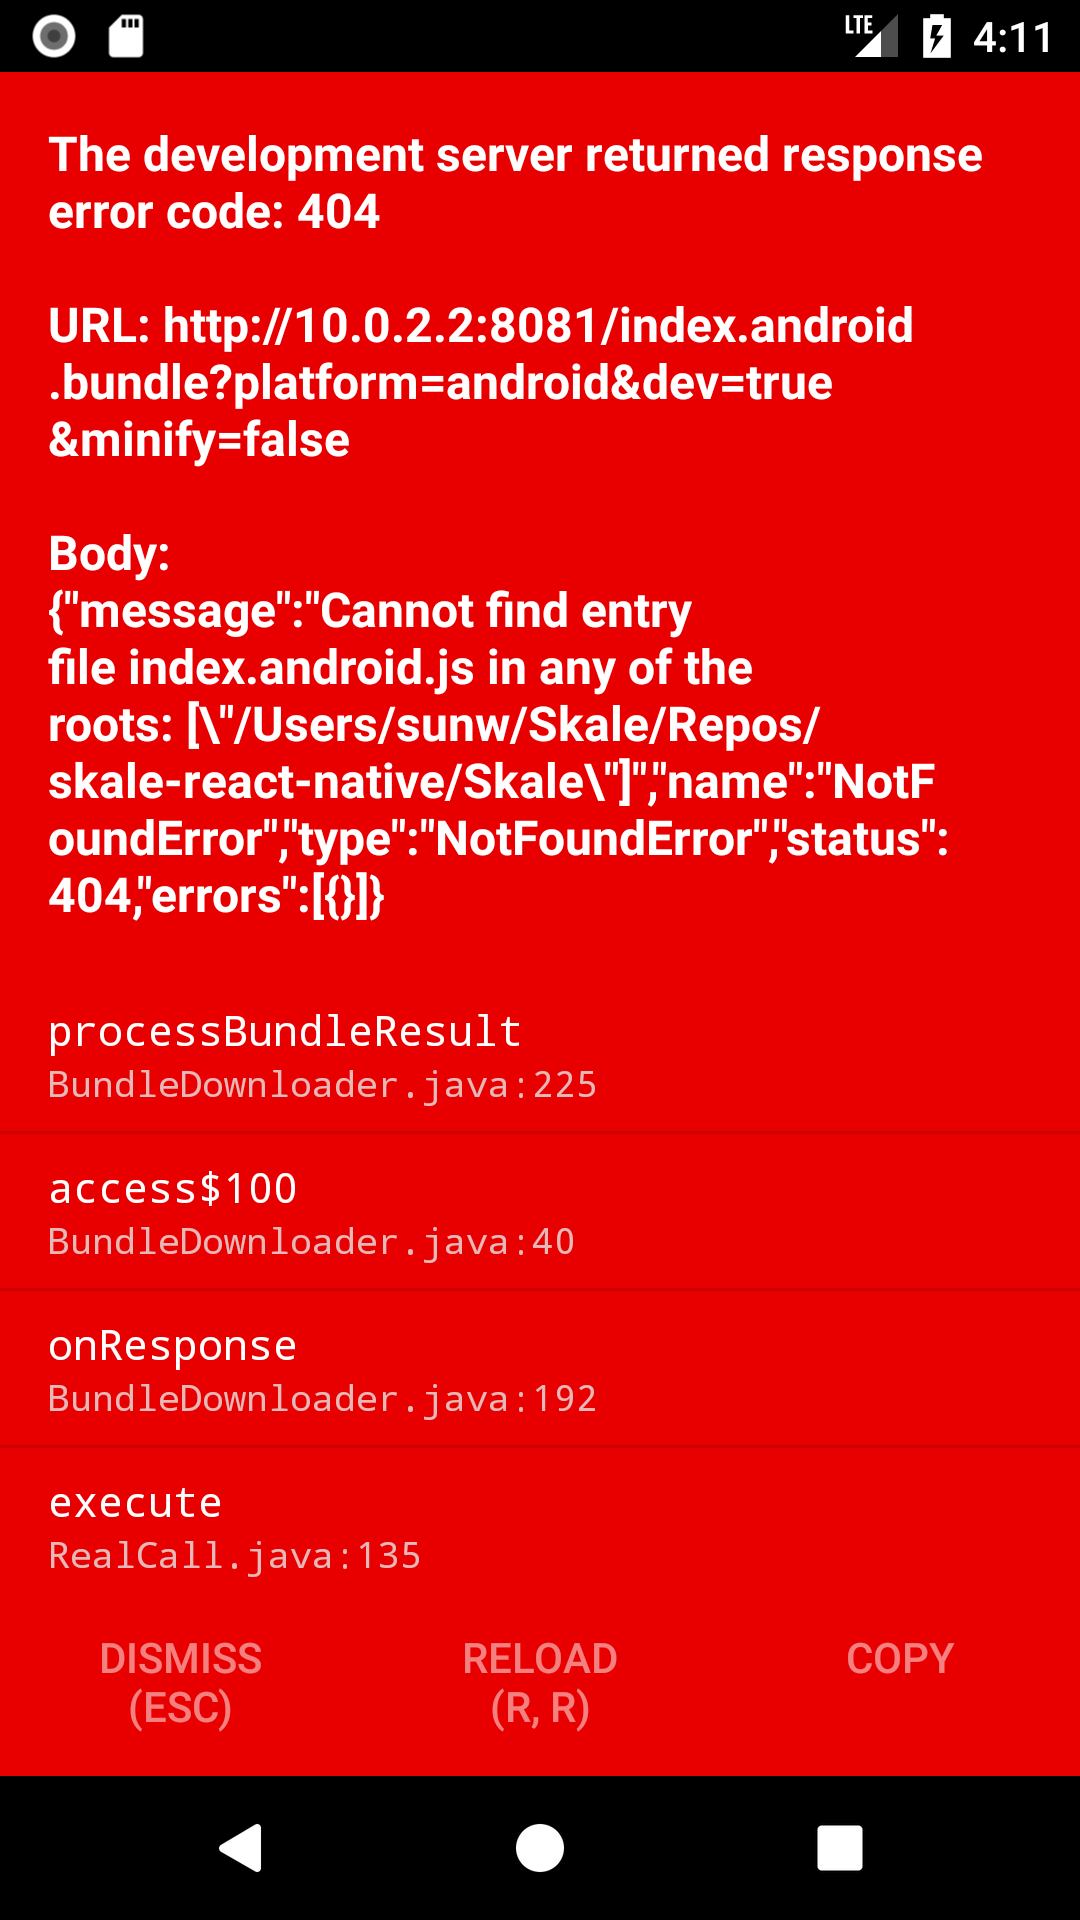 screenshot_1508818289